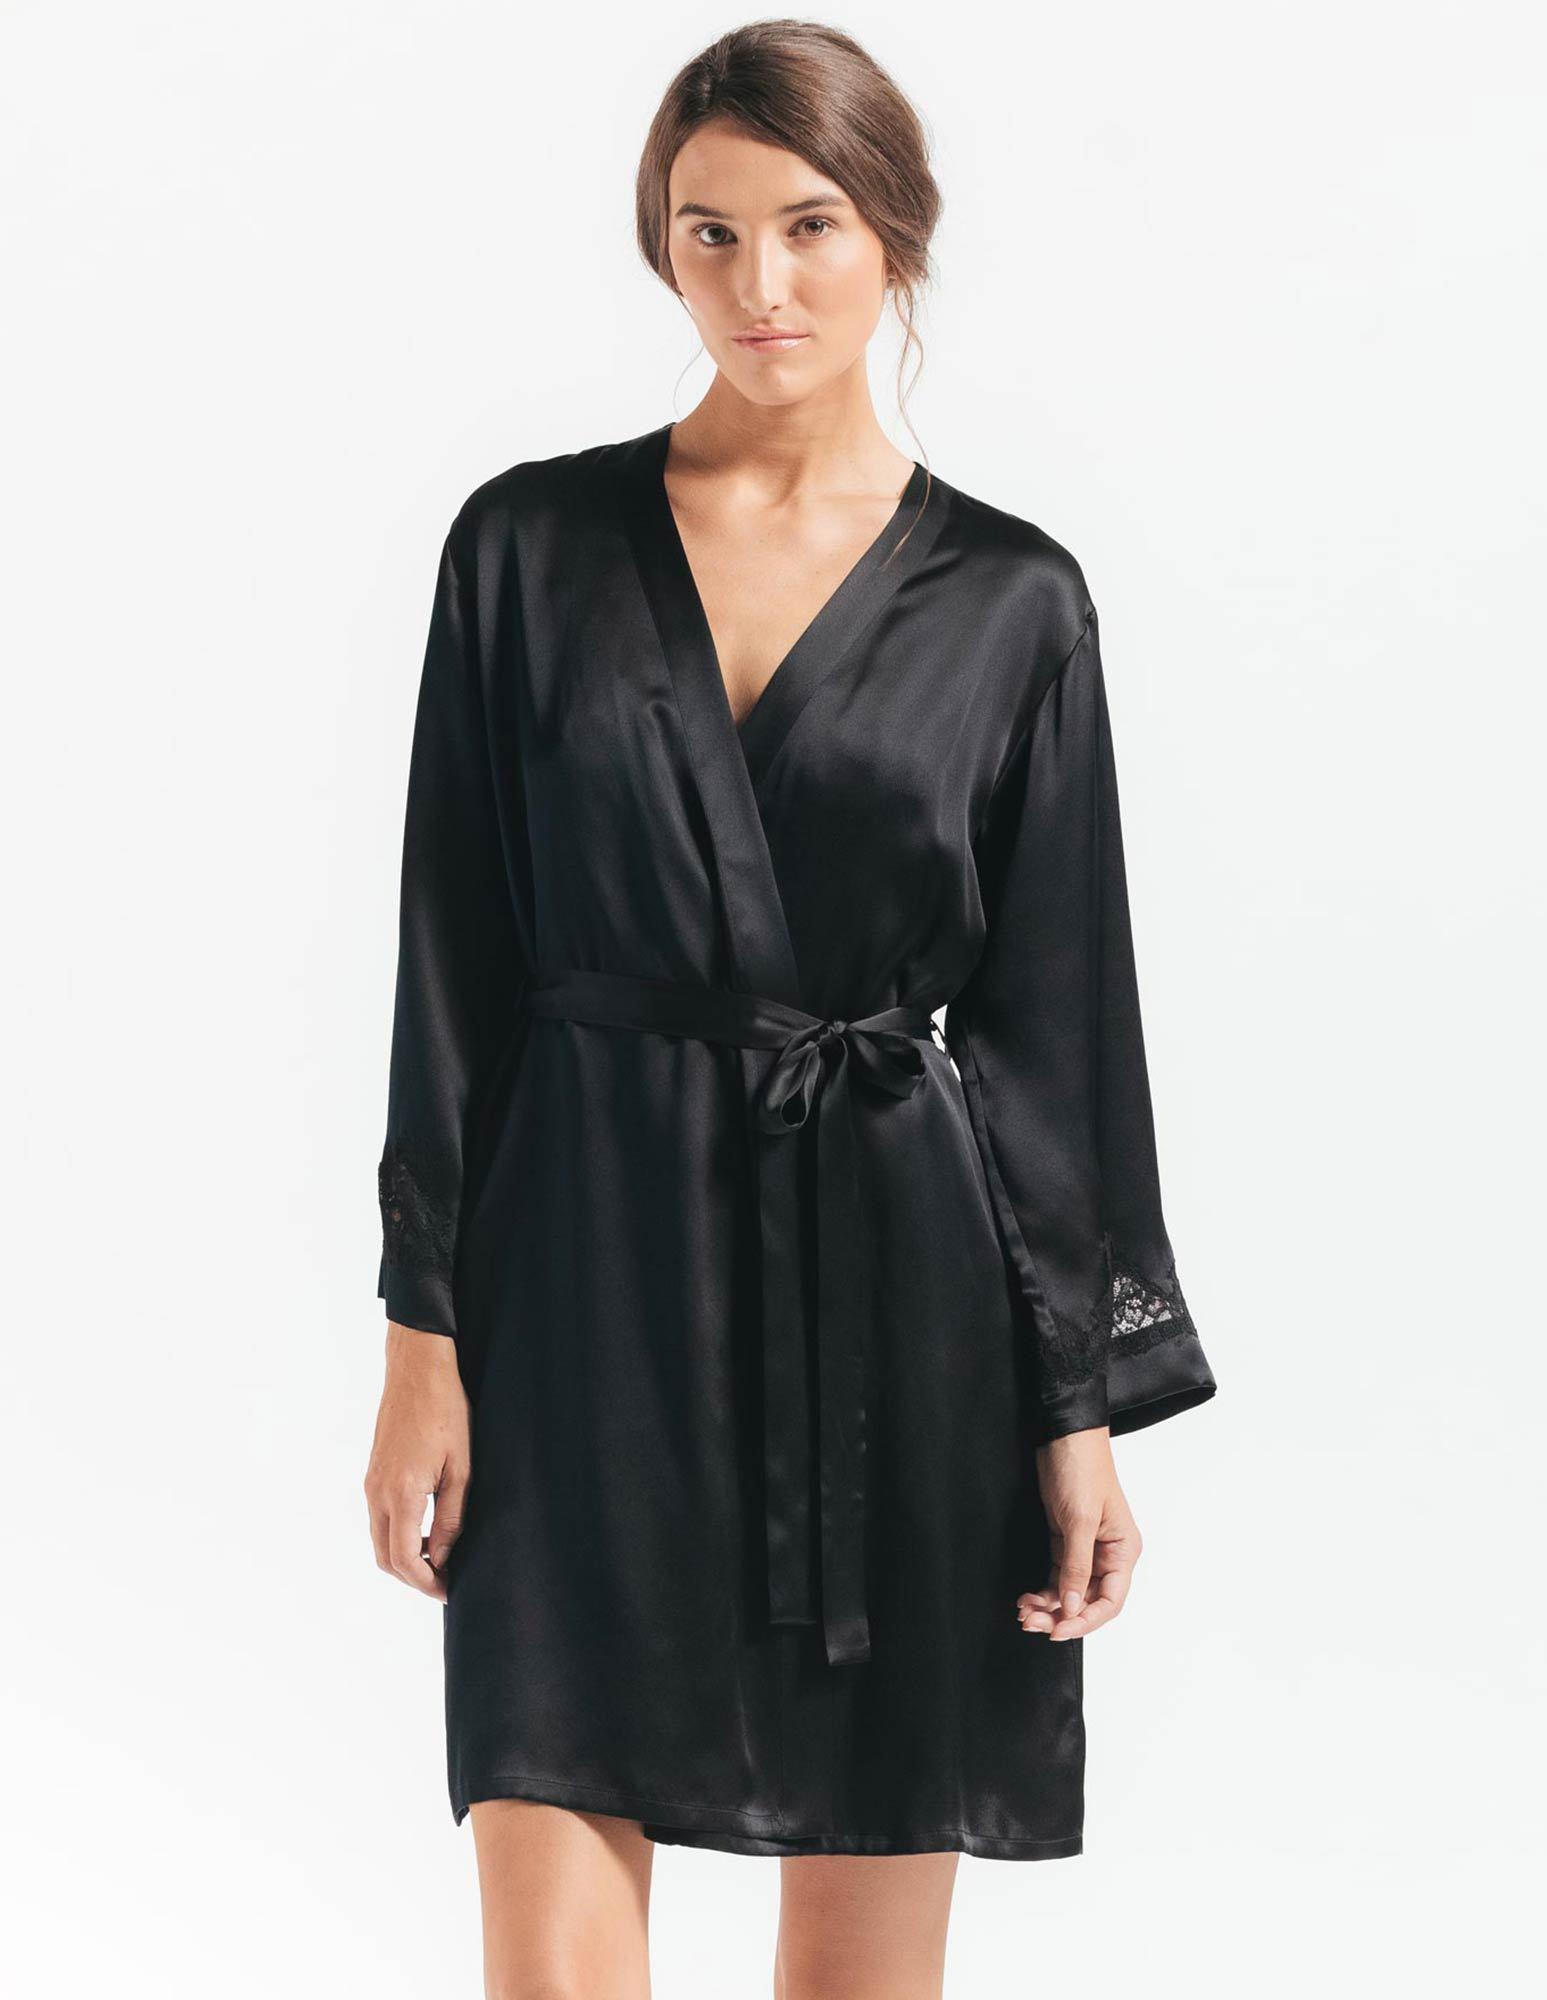 53. Morgan Robe $240. S-L. Black